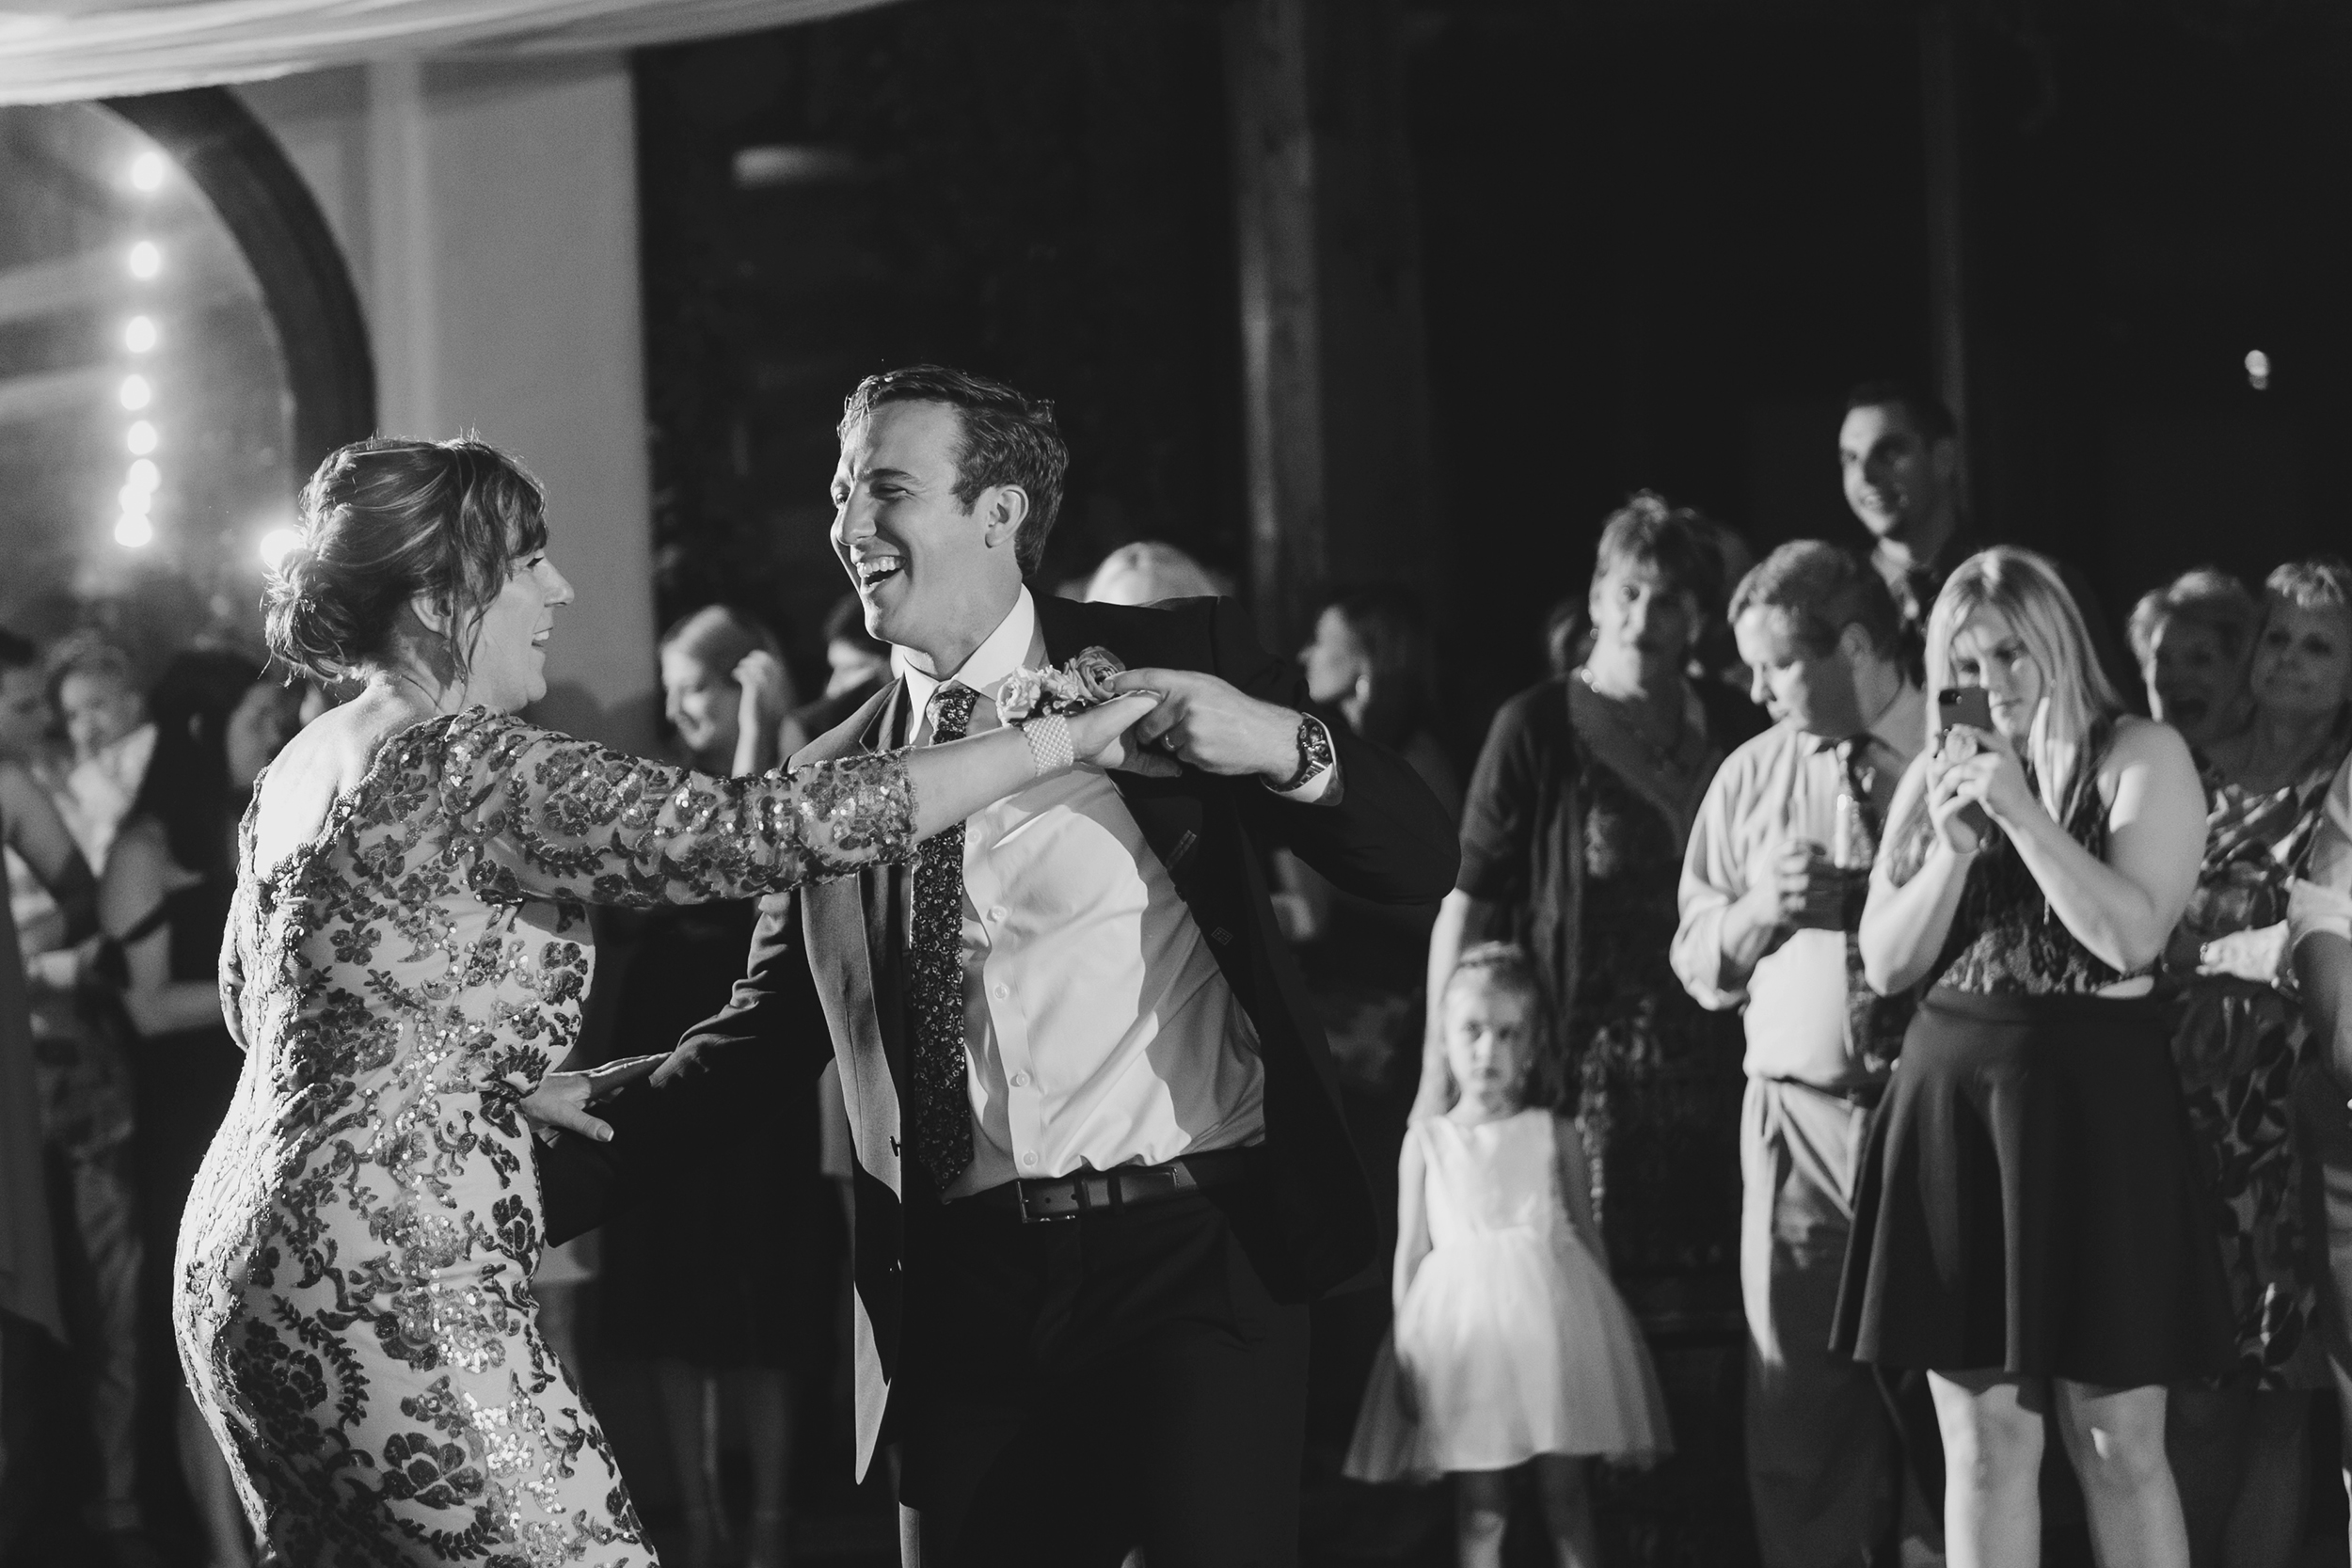 Austin_Wedding_Photographer_Kimberly_Brooke_Photographic_108.jpg